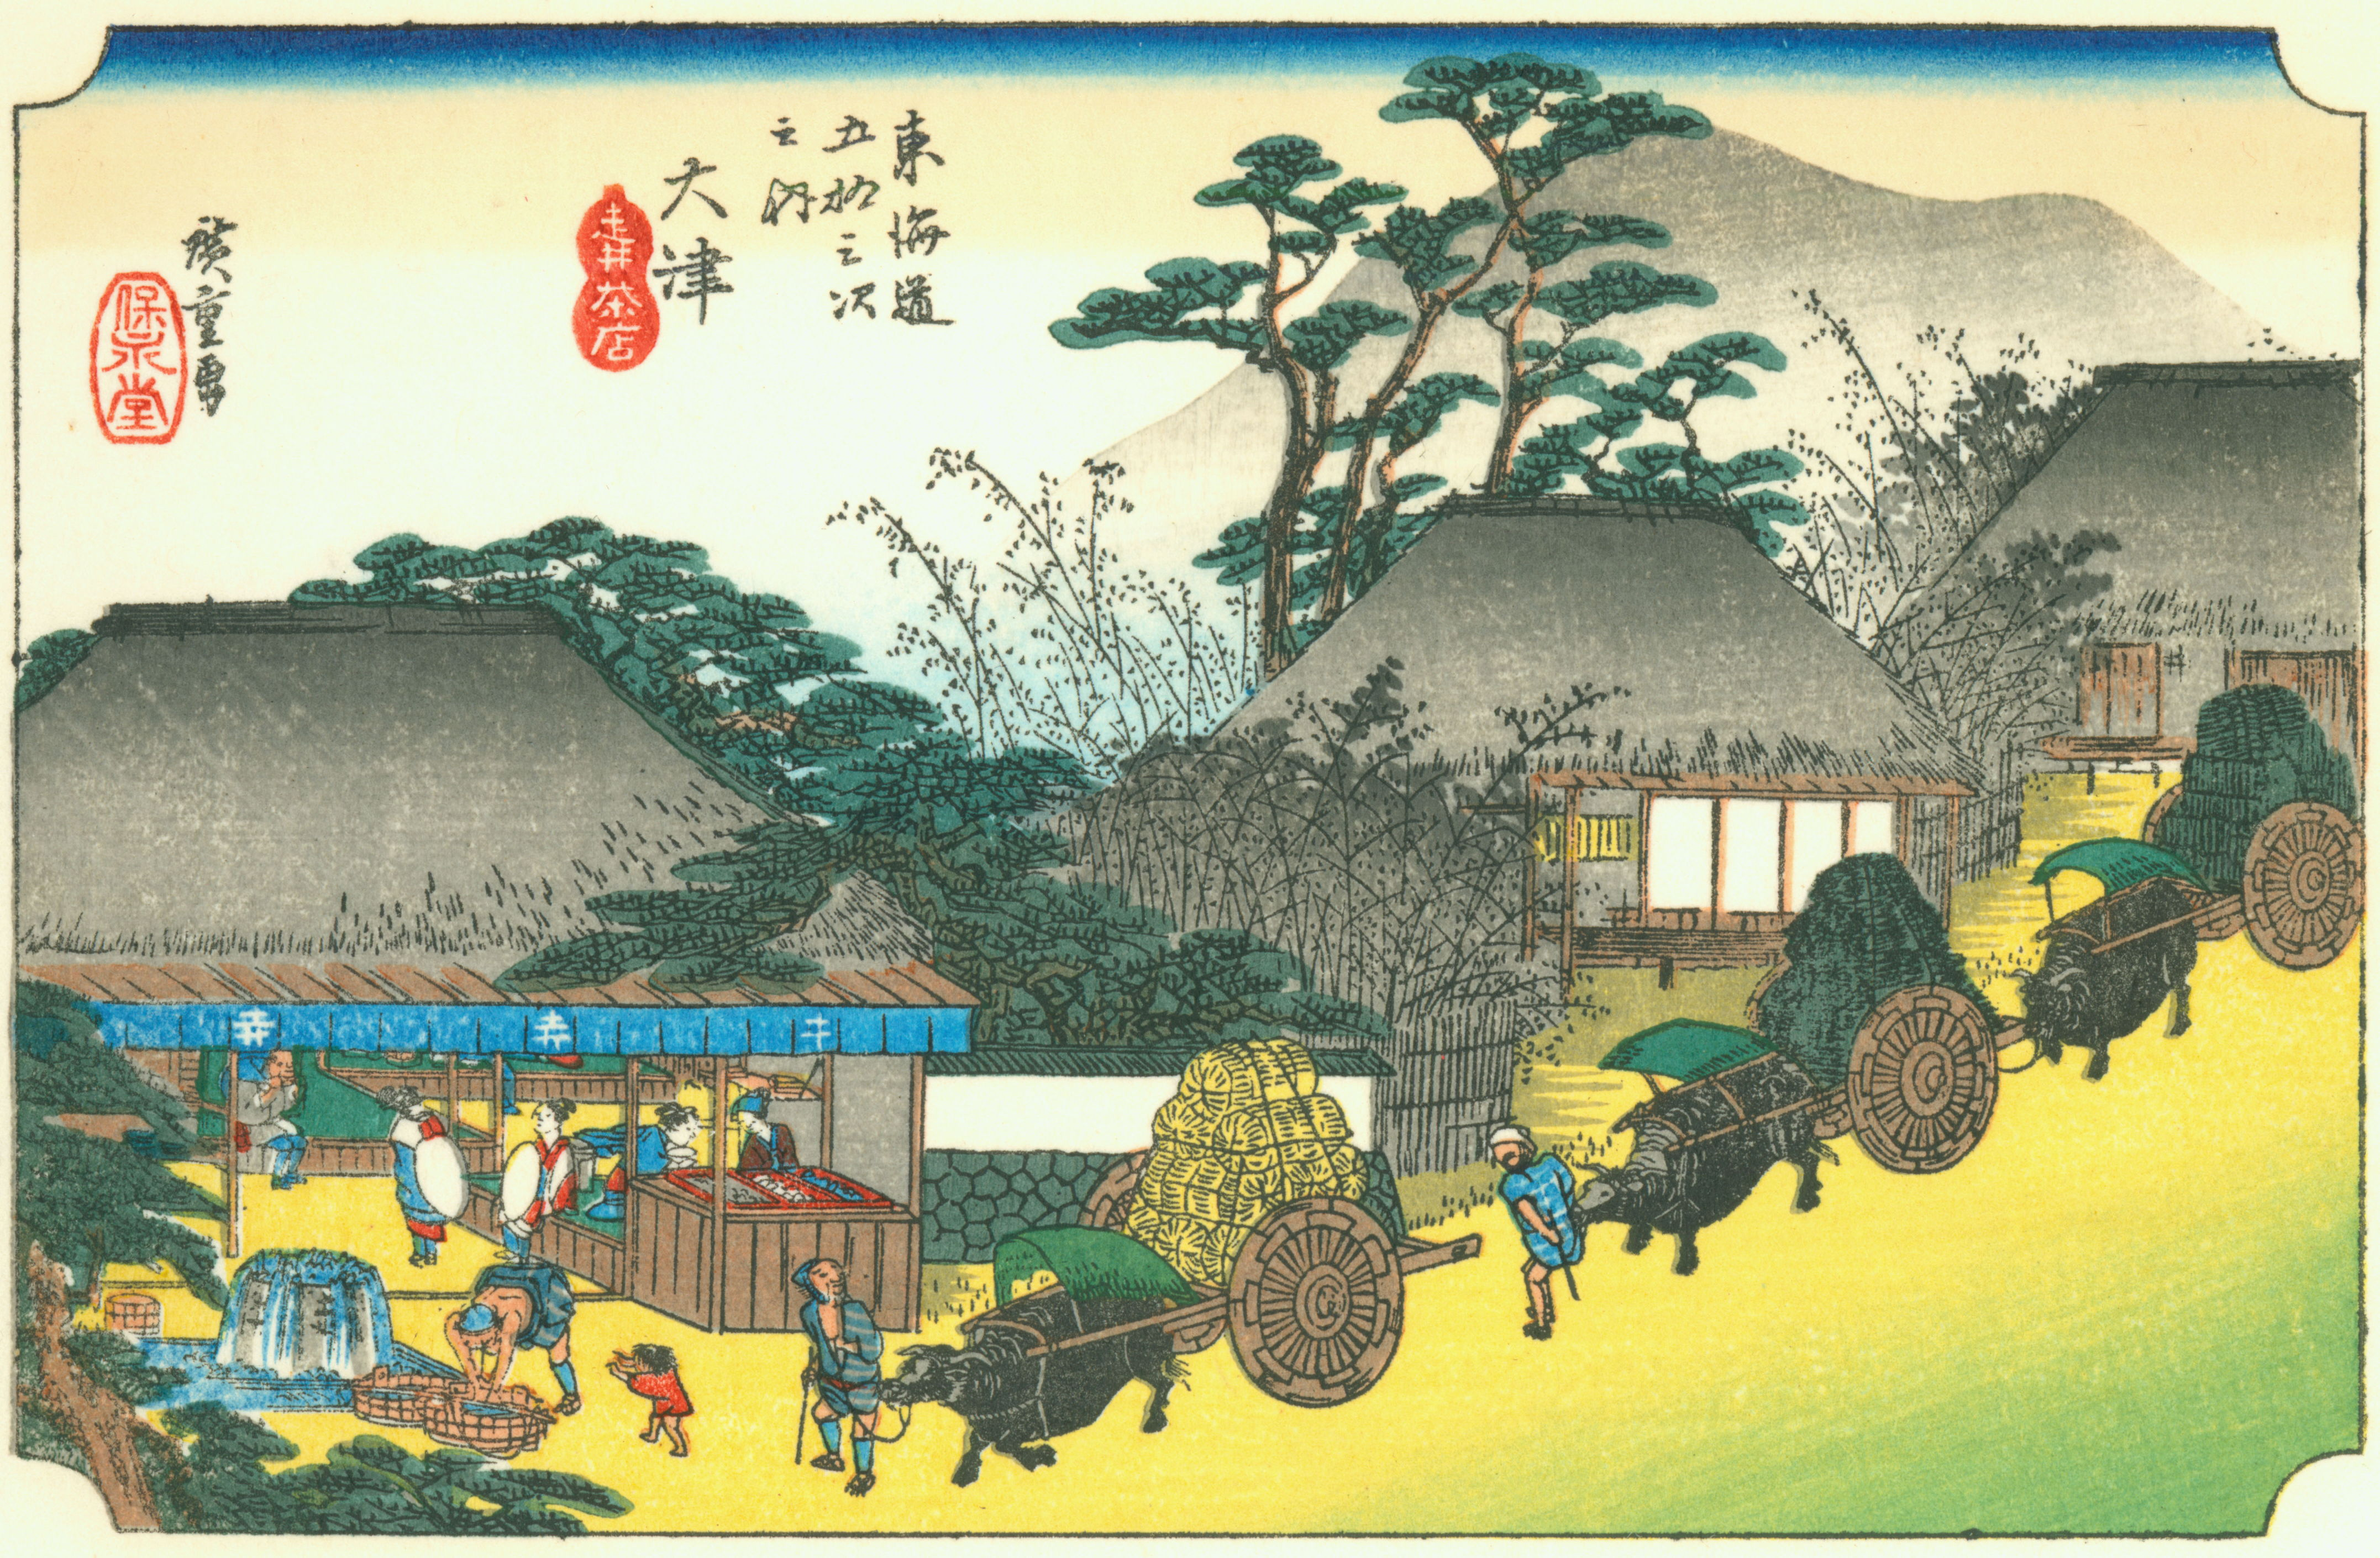 http://upload.wikimedia.org/wikipedia/commons/c/c2/Hiroshige54_ohtsu.jpg